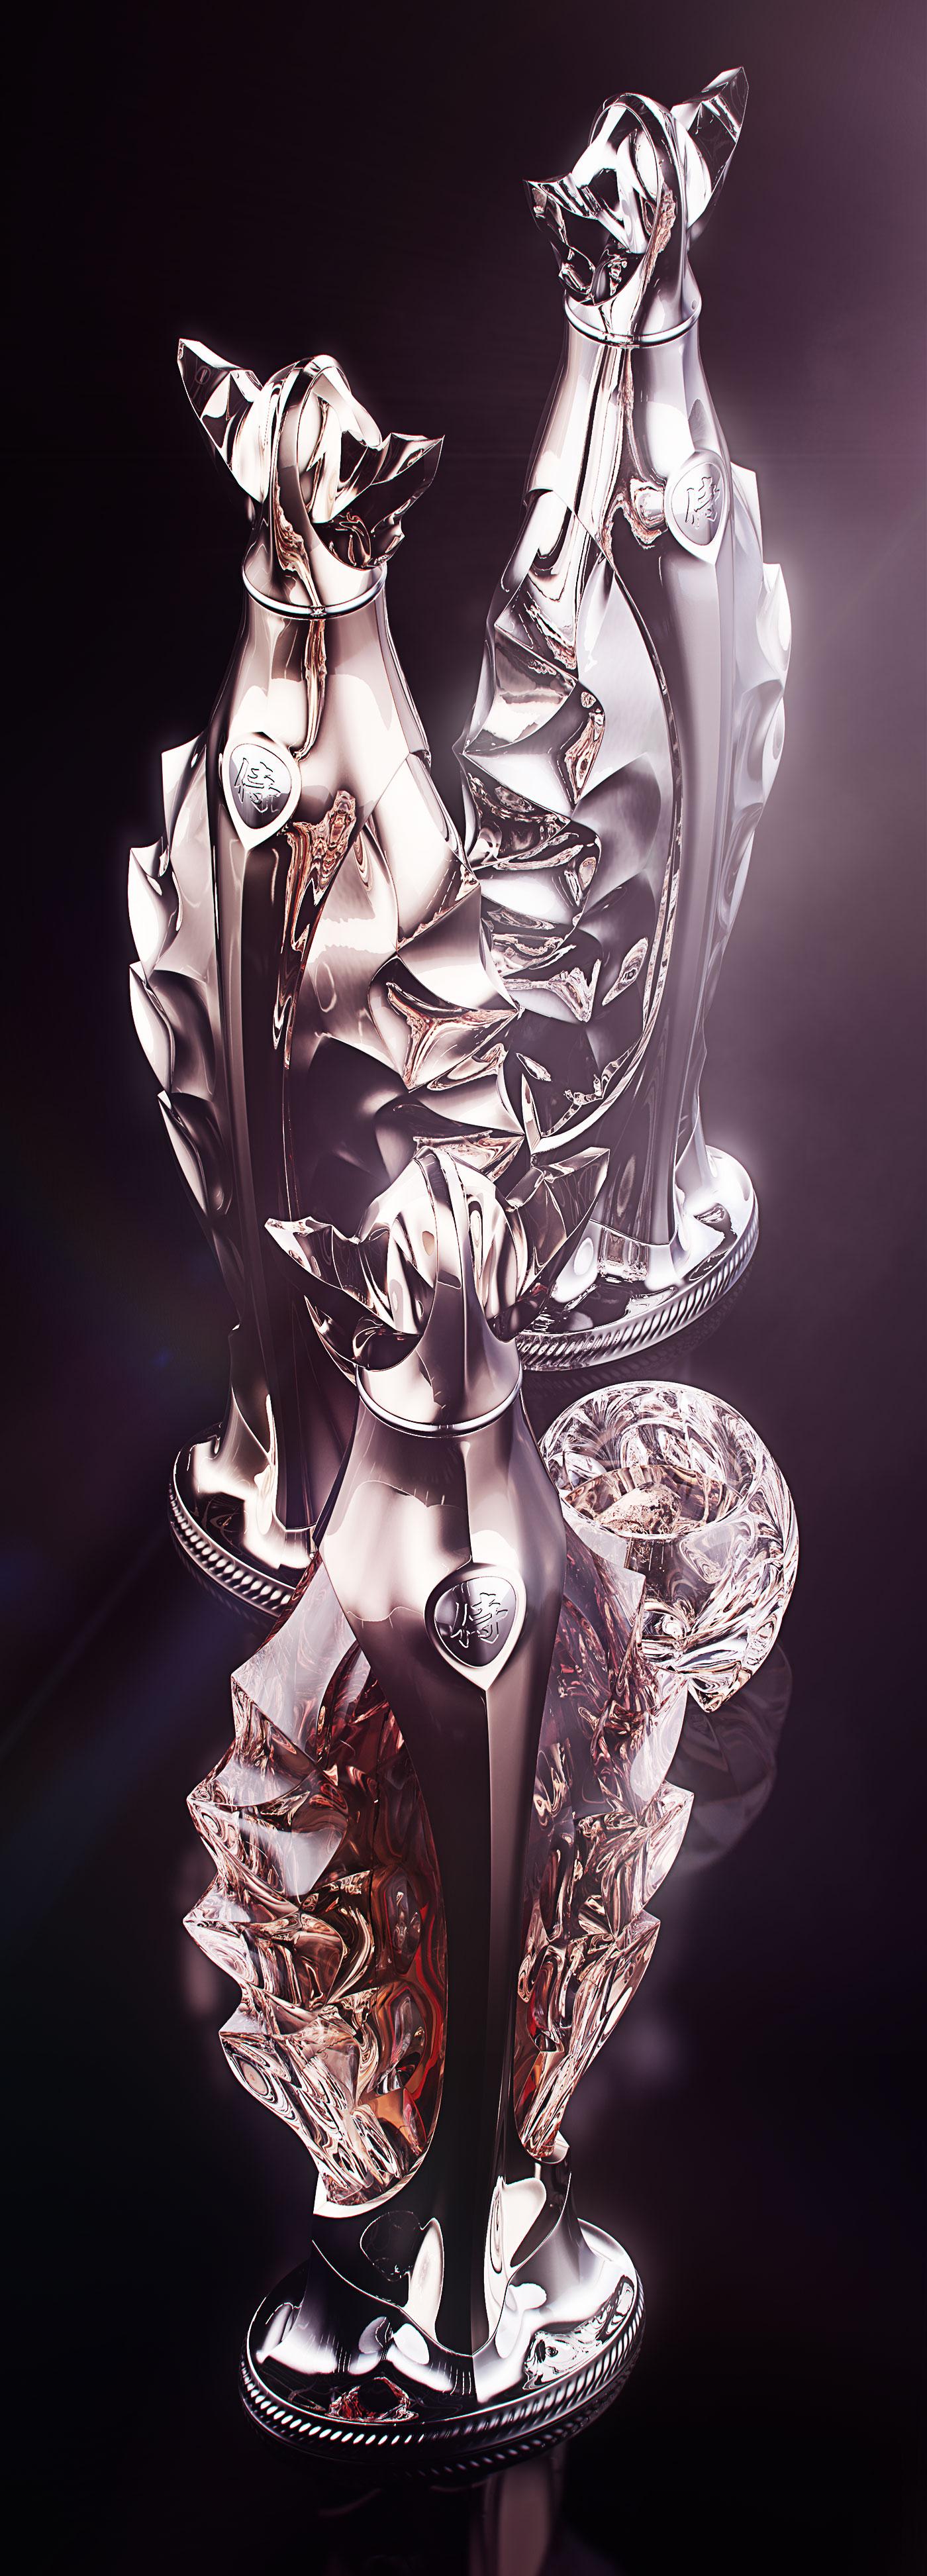 Luxury Whiskey Bottle Concept 8